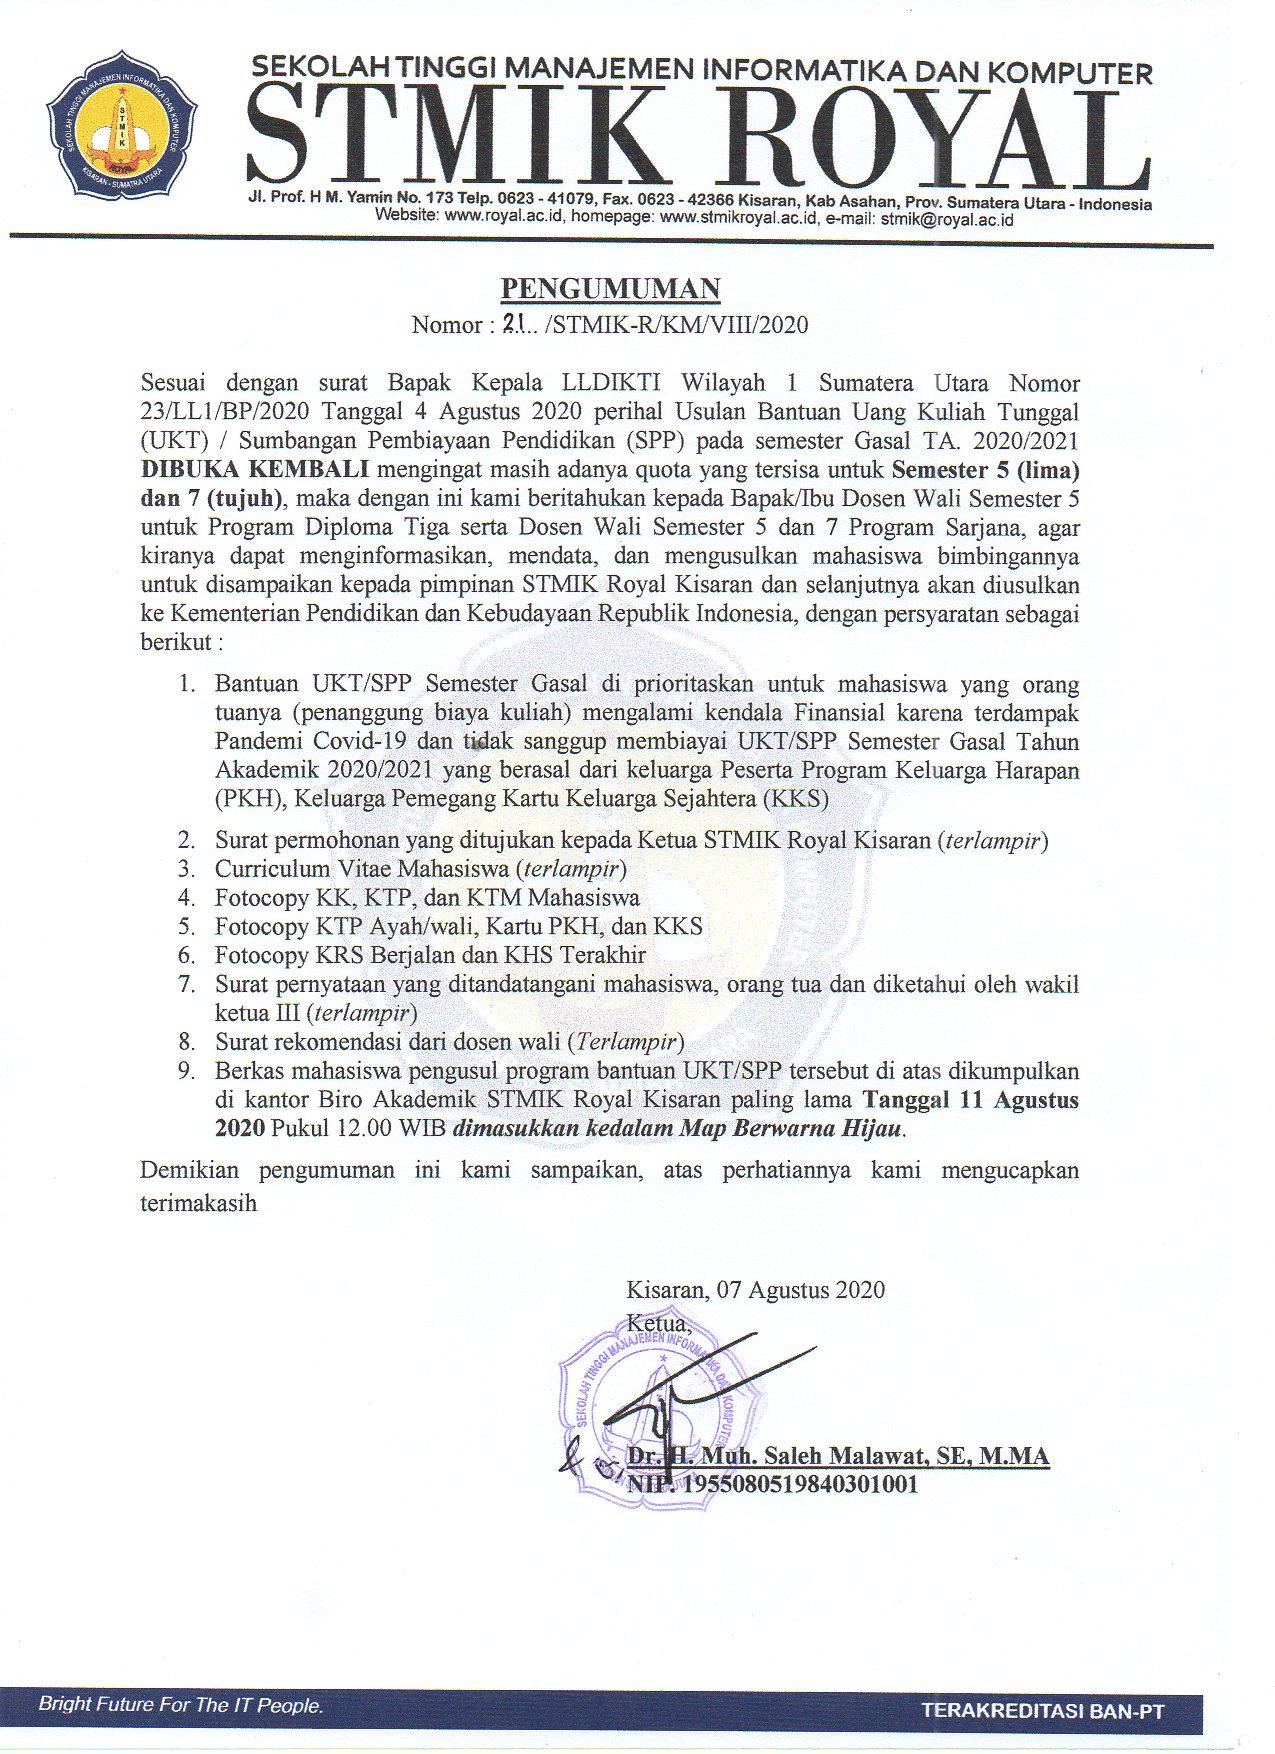 PENGUMUMAN PENAMBAHAN KUOTA BANTUAN UANG KULIAH TUNGGAL (UKT) / SUMBANGAN PEMBIAYAAN PENDIDIKAN (SPP) SEMESTER GASAL TA. 2020/2021 STMIK ROYAL